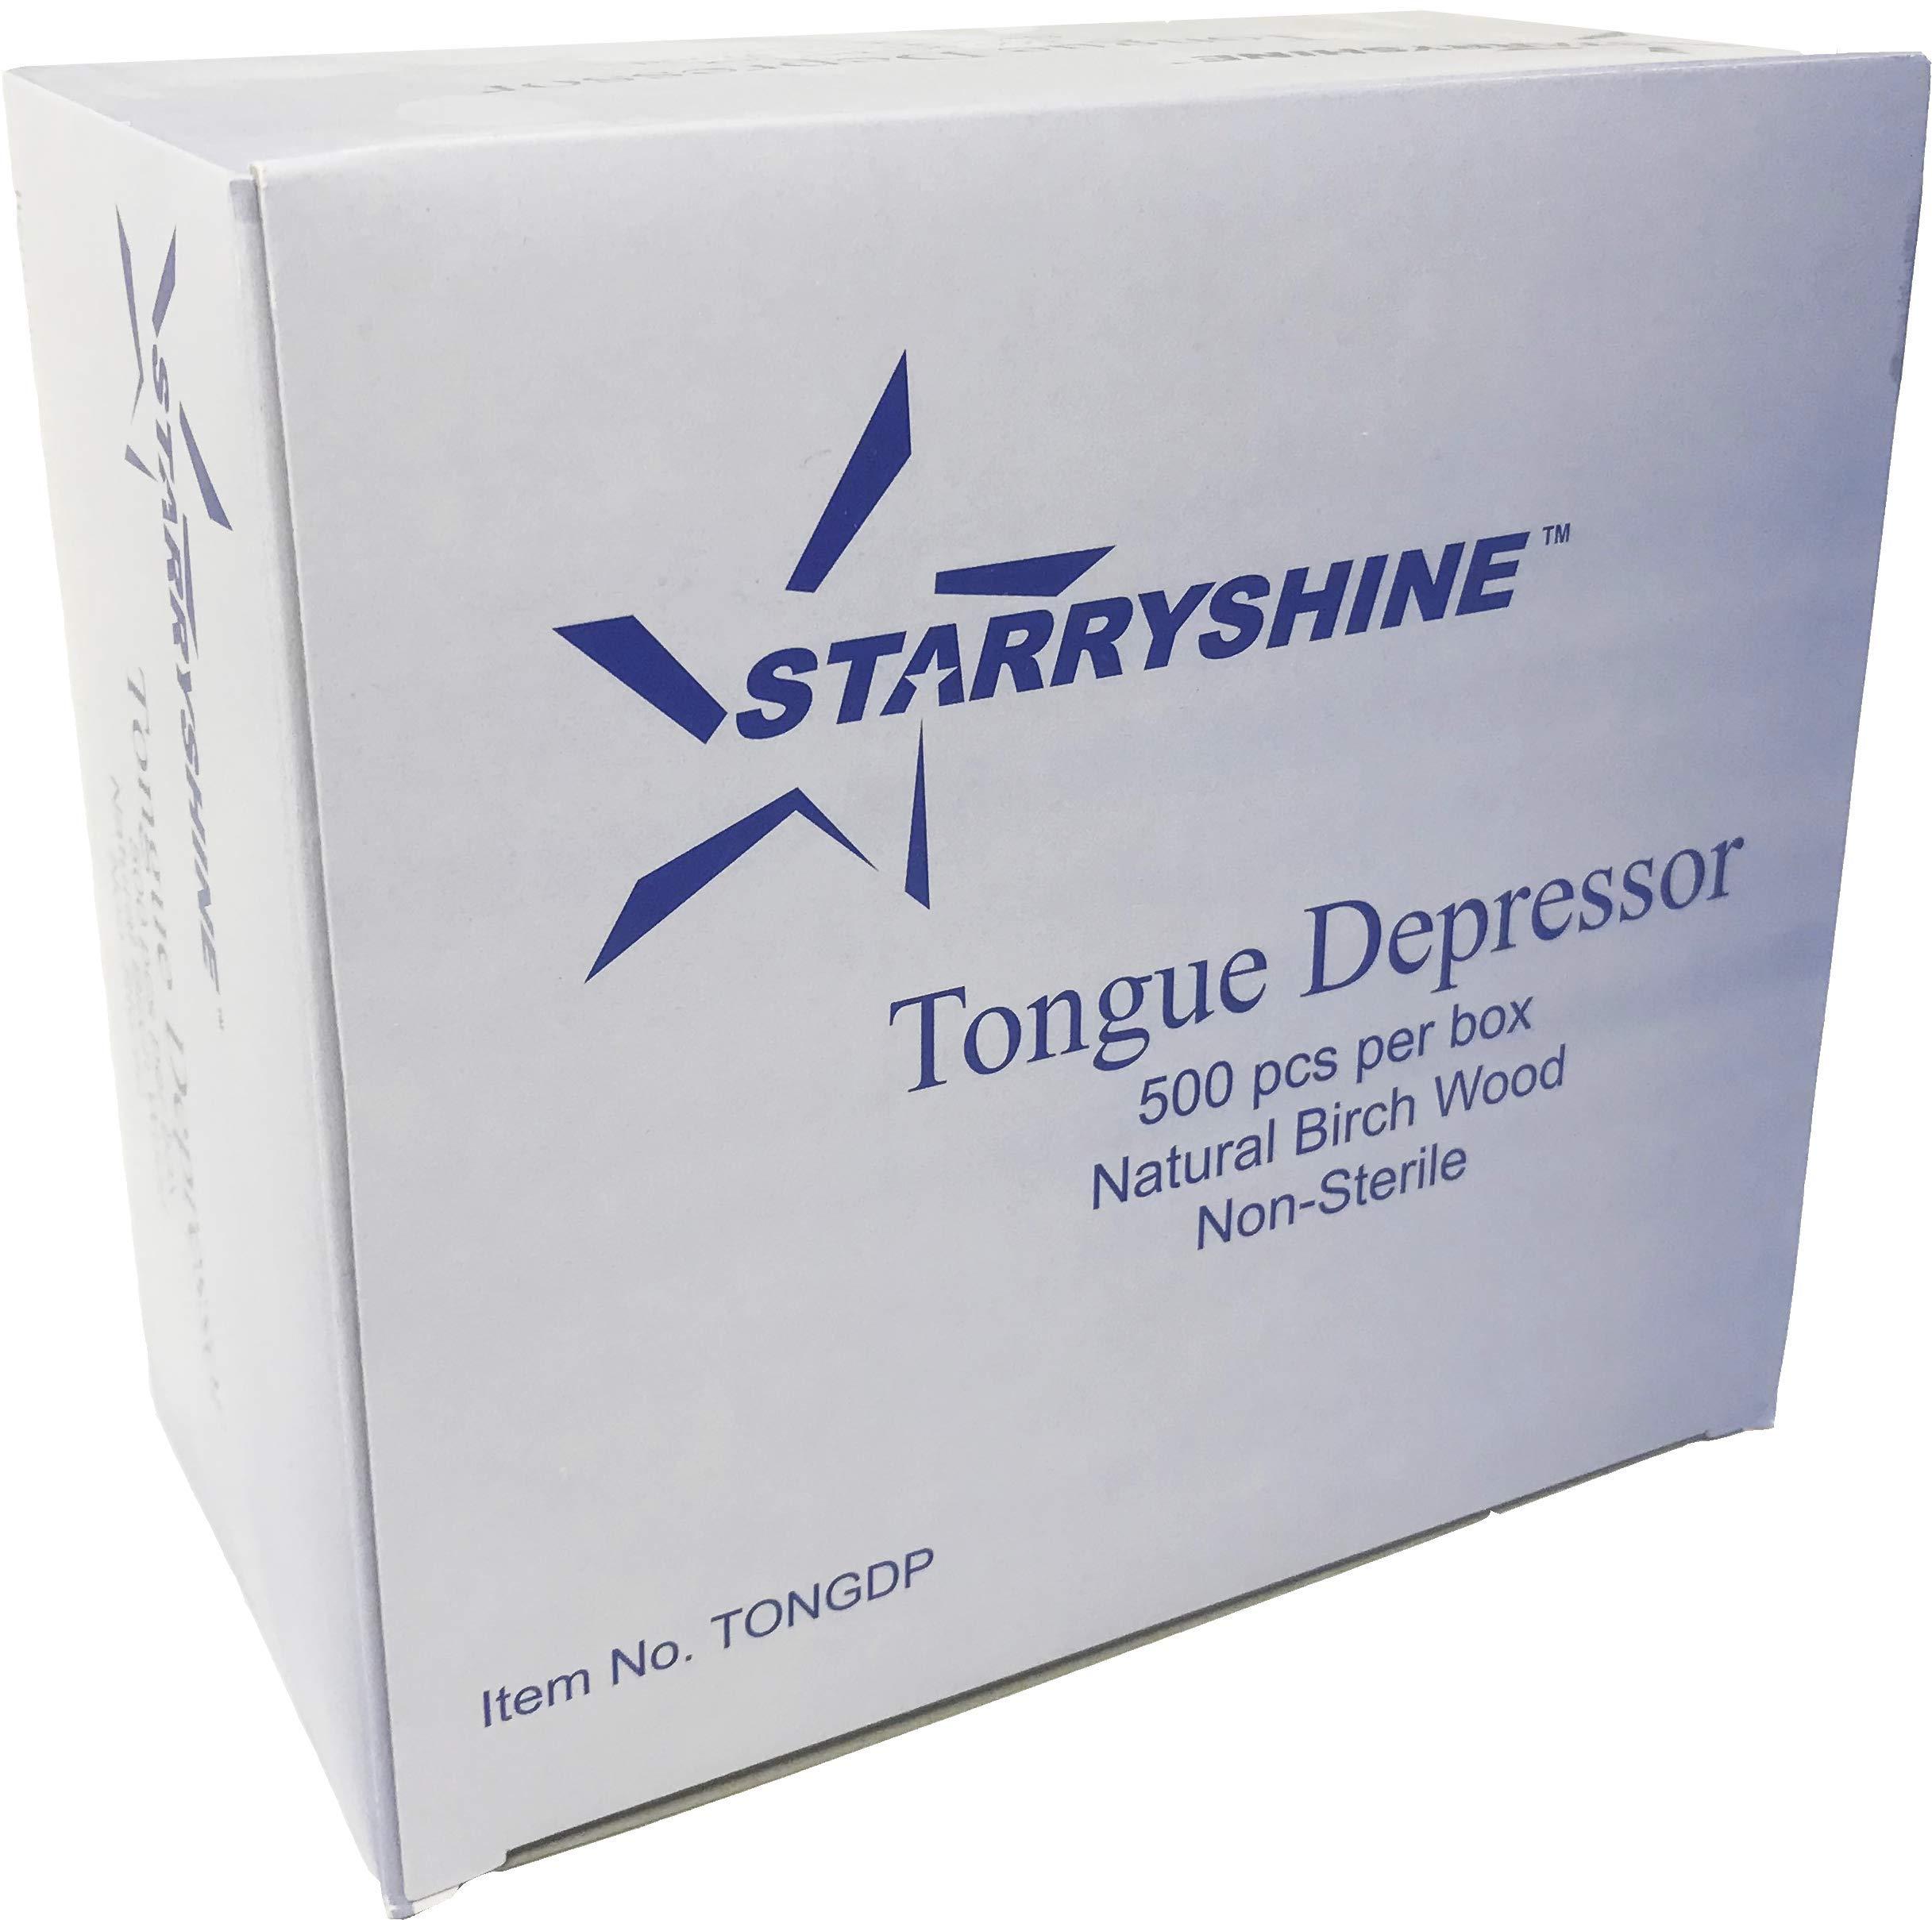 Tongue Depressors Non-STERILE Standard Size 6''x0.75'', Premium Natural Birch Wood Craft Sticks (2500 PCS (5 BX)) by Starryshine (Image #5)